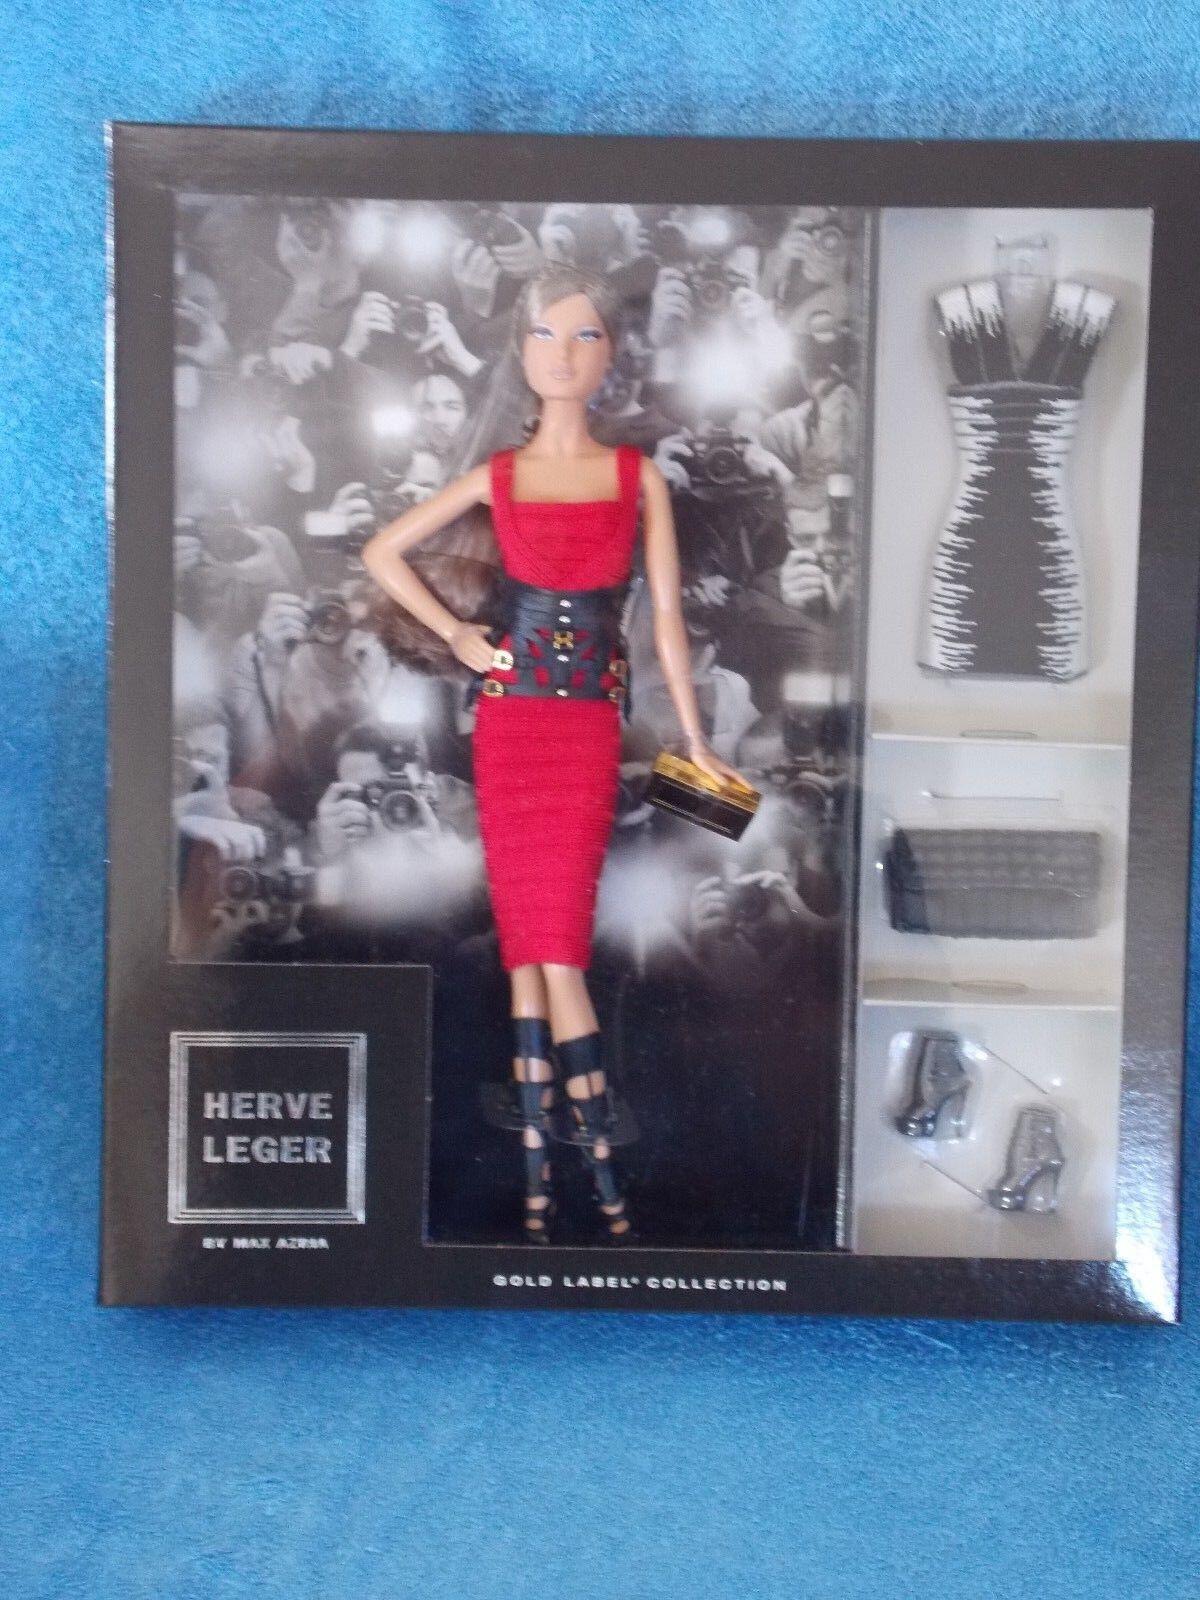 Herve Leger Muñeca Barbie by Max Azria 2013